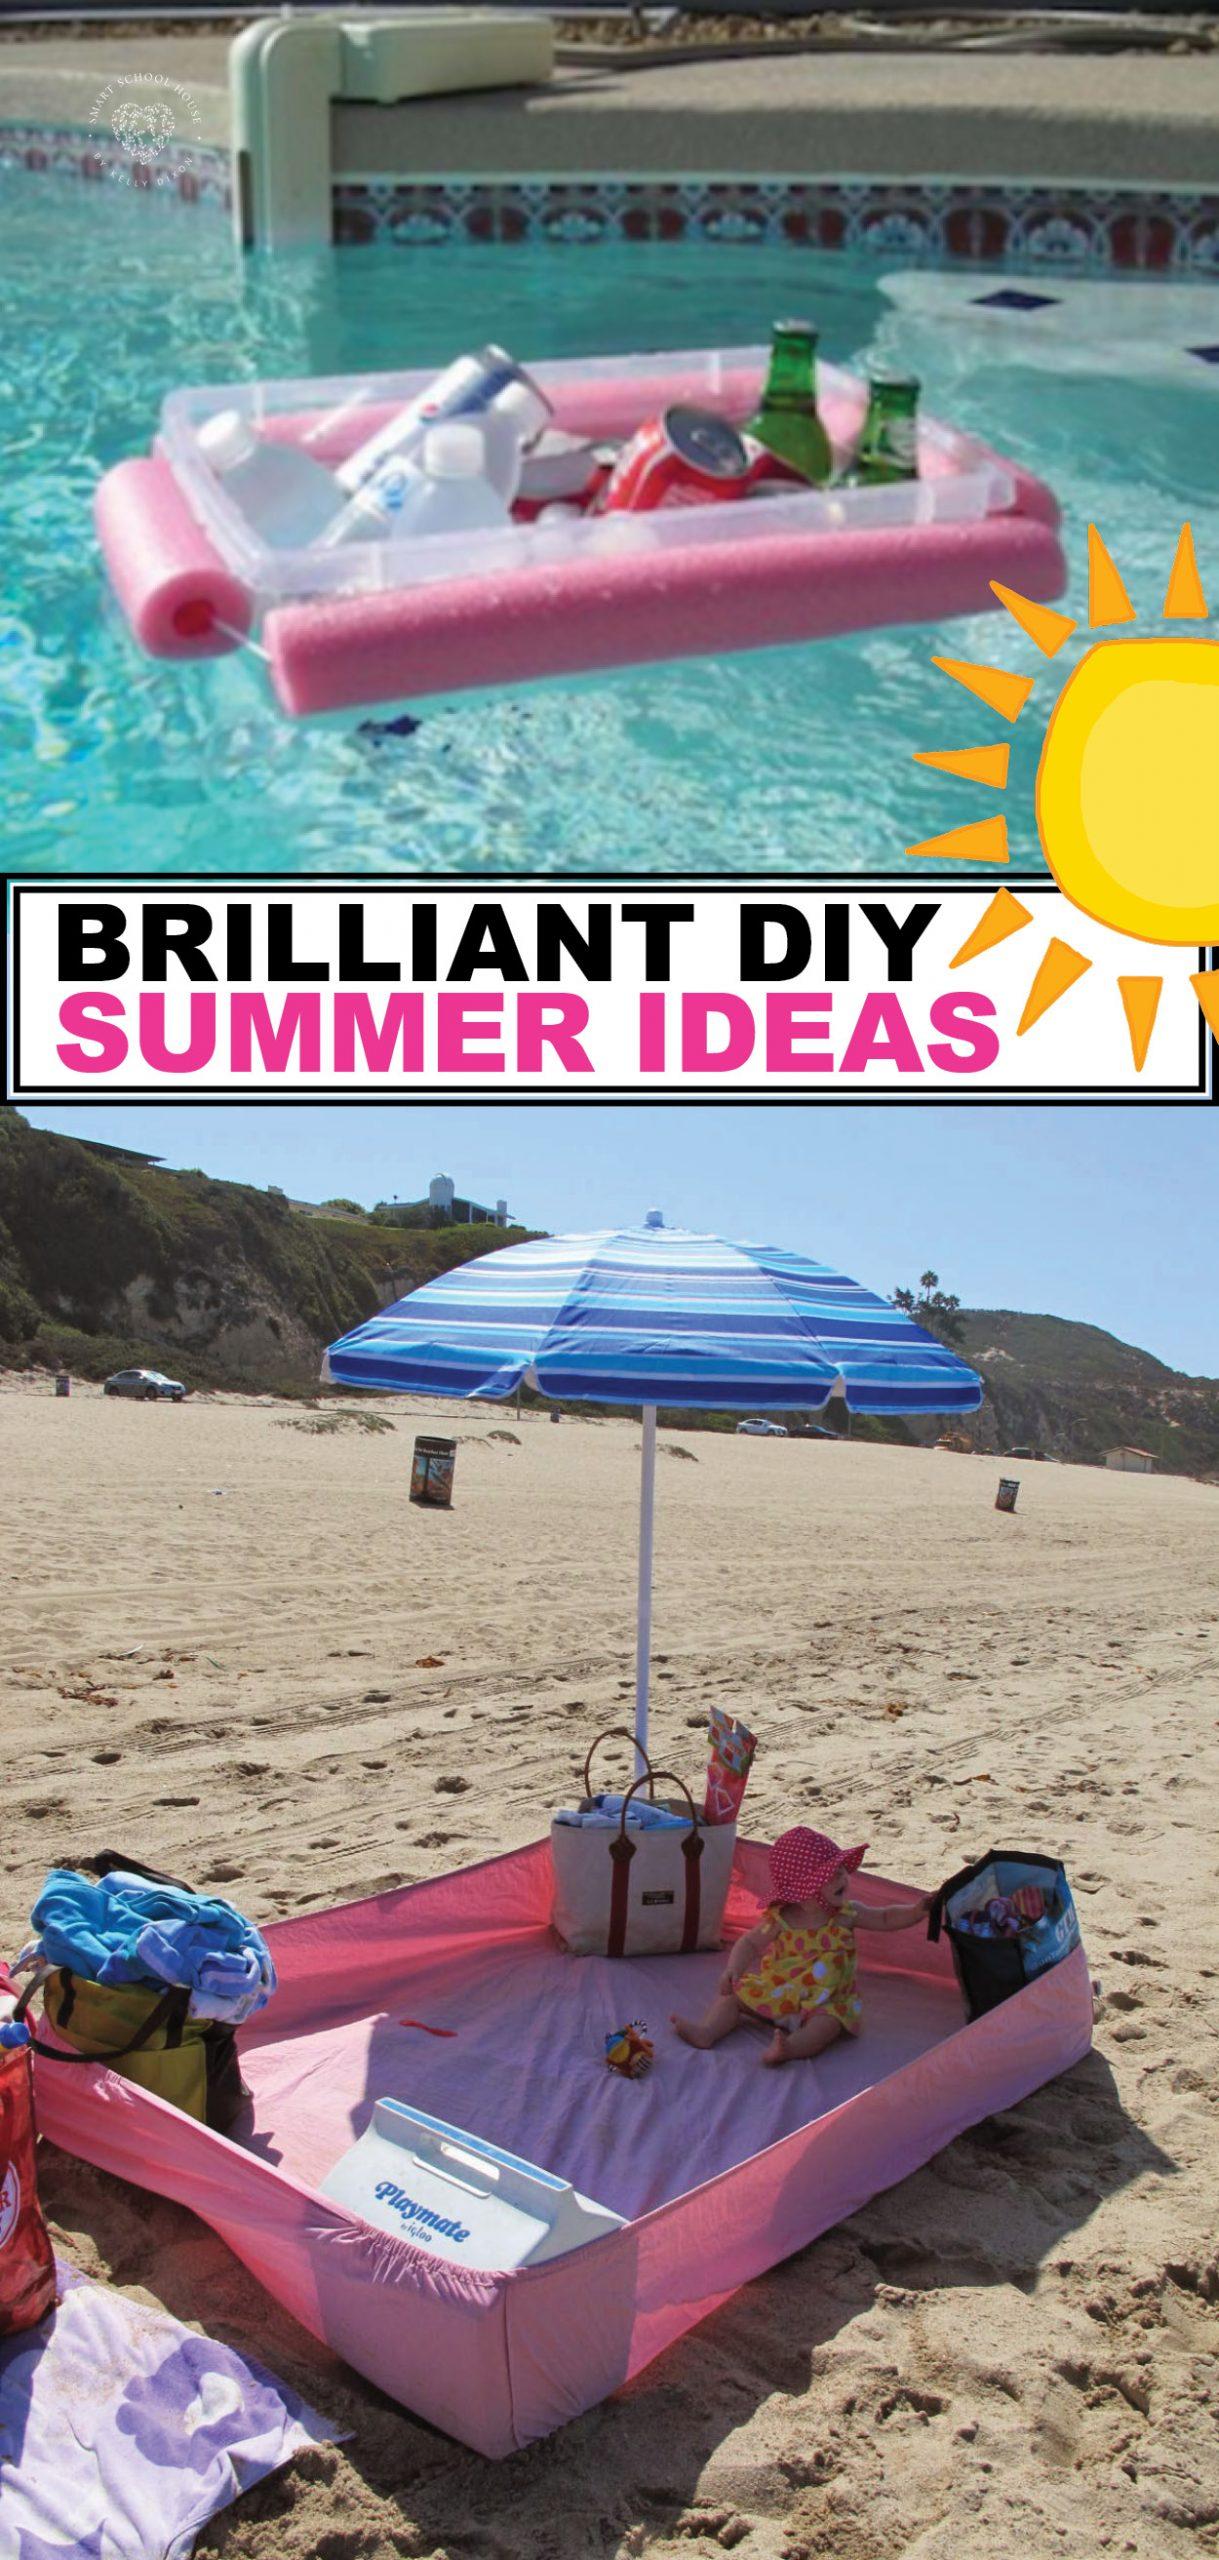 Brilliant DIY Summer Ideas